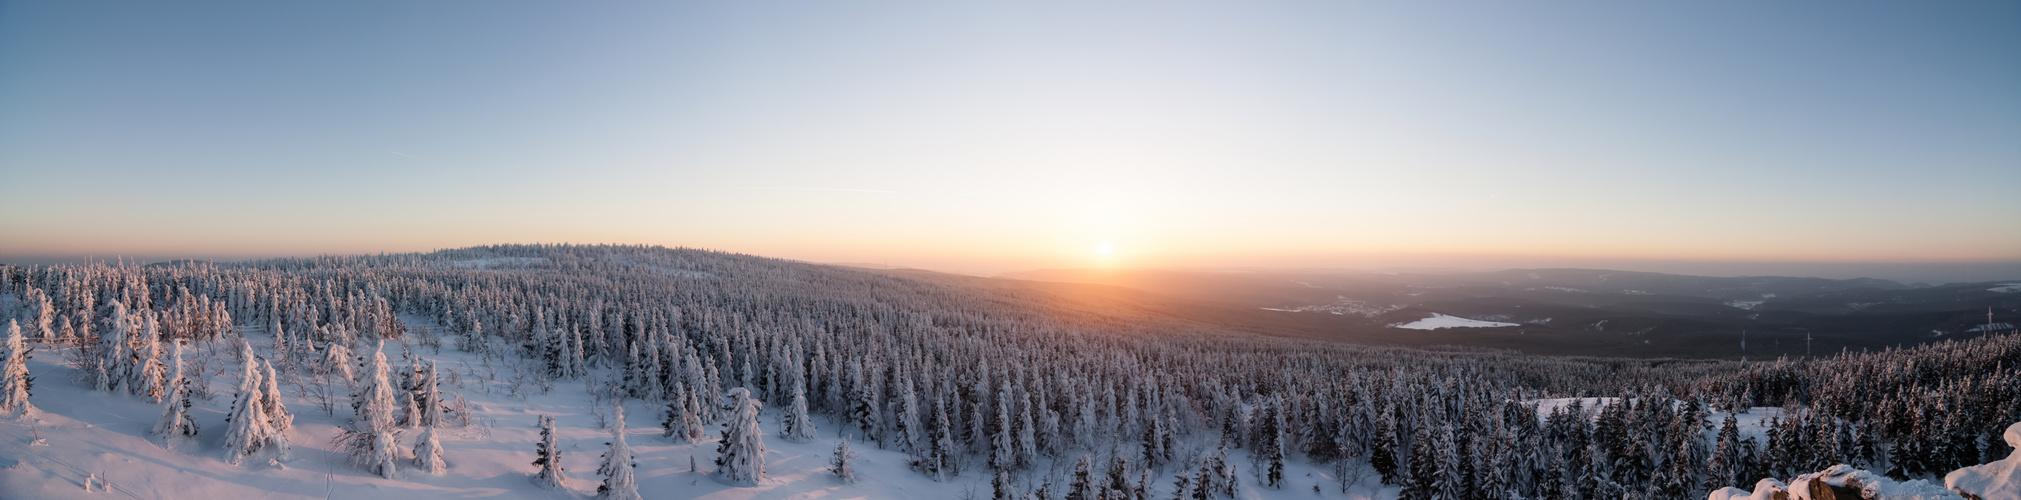 Winterliches Sonnenuntergangspanorama II